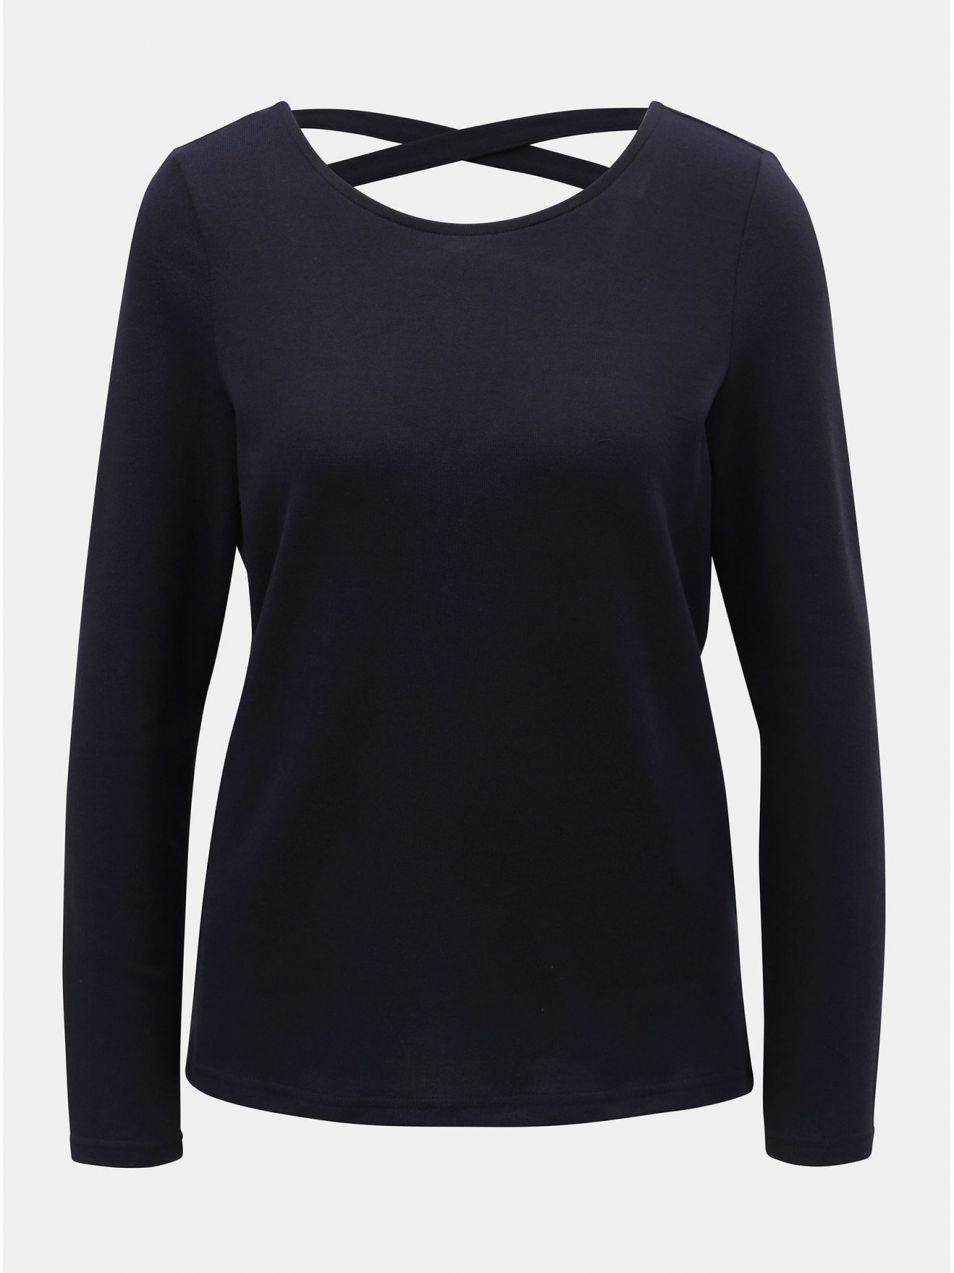 a7b88aa8da Tmavomodré tričko s pásikmi na chrbte Jacqueline de Yong Emily ...